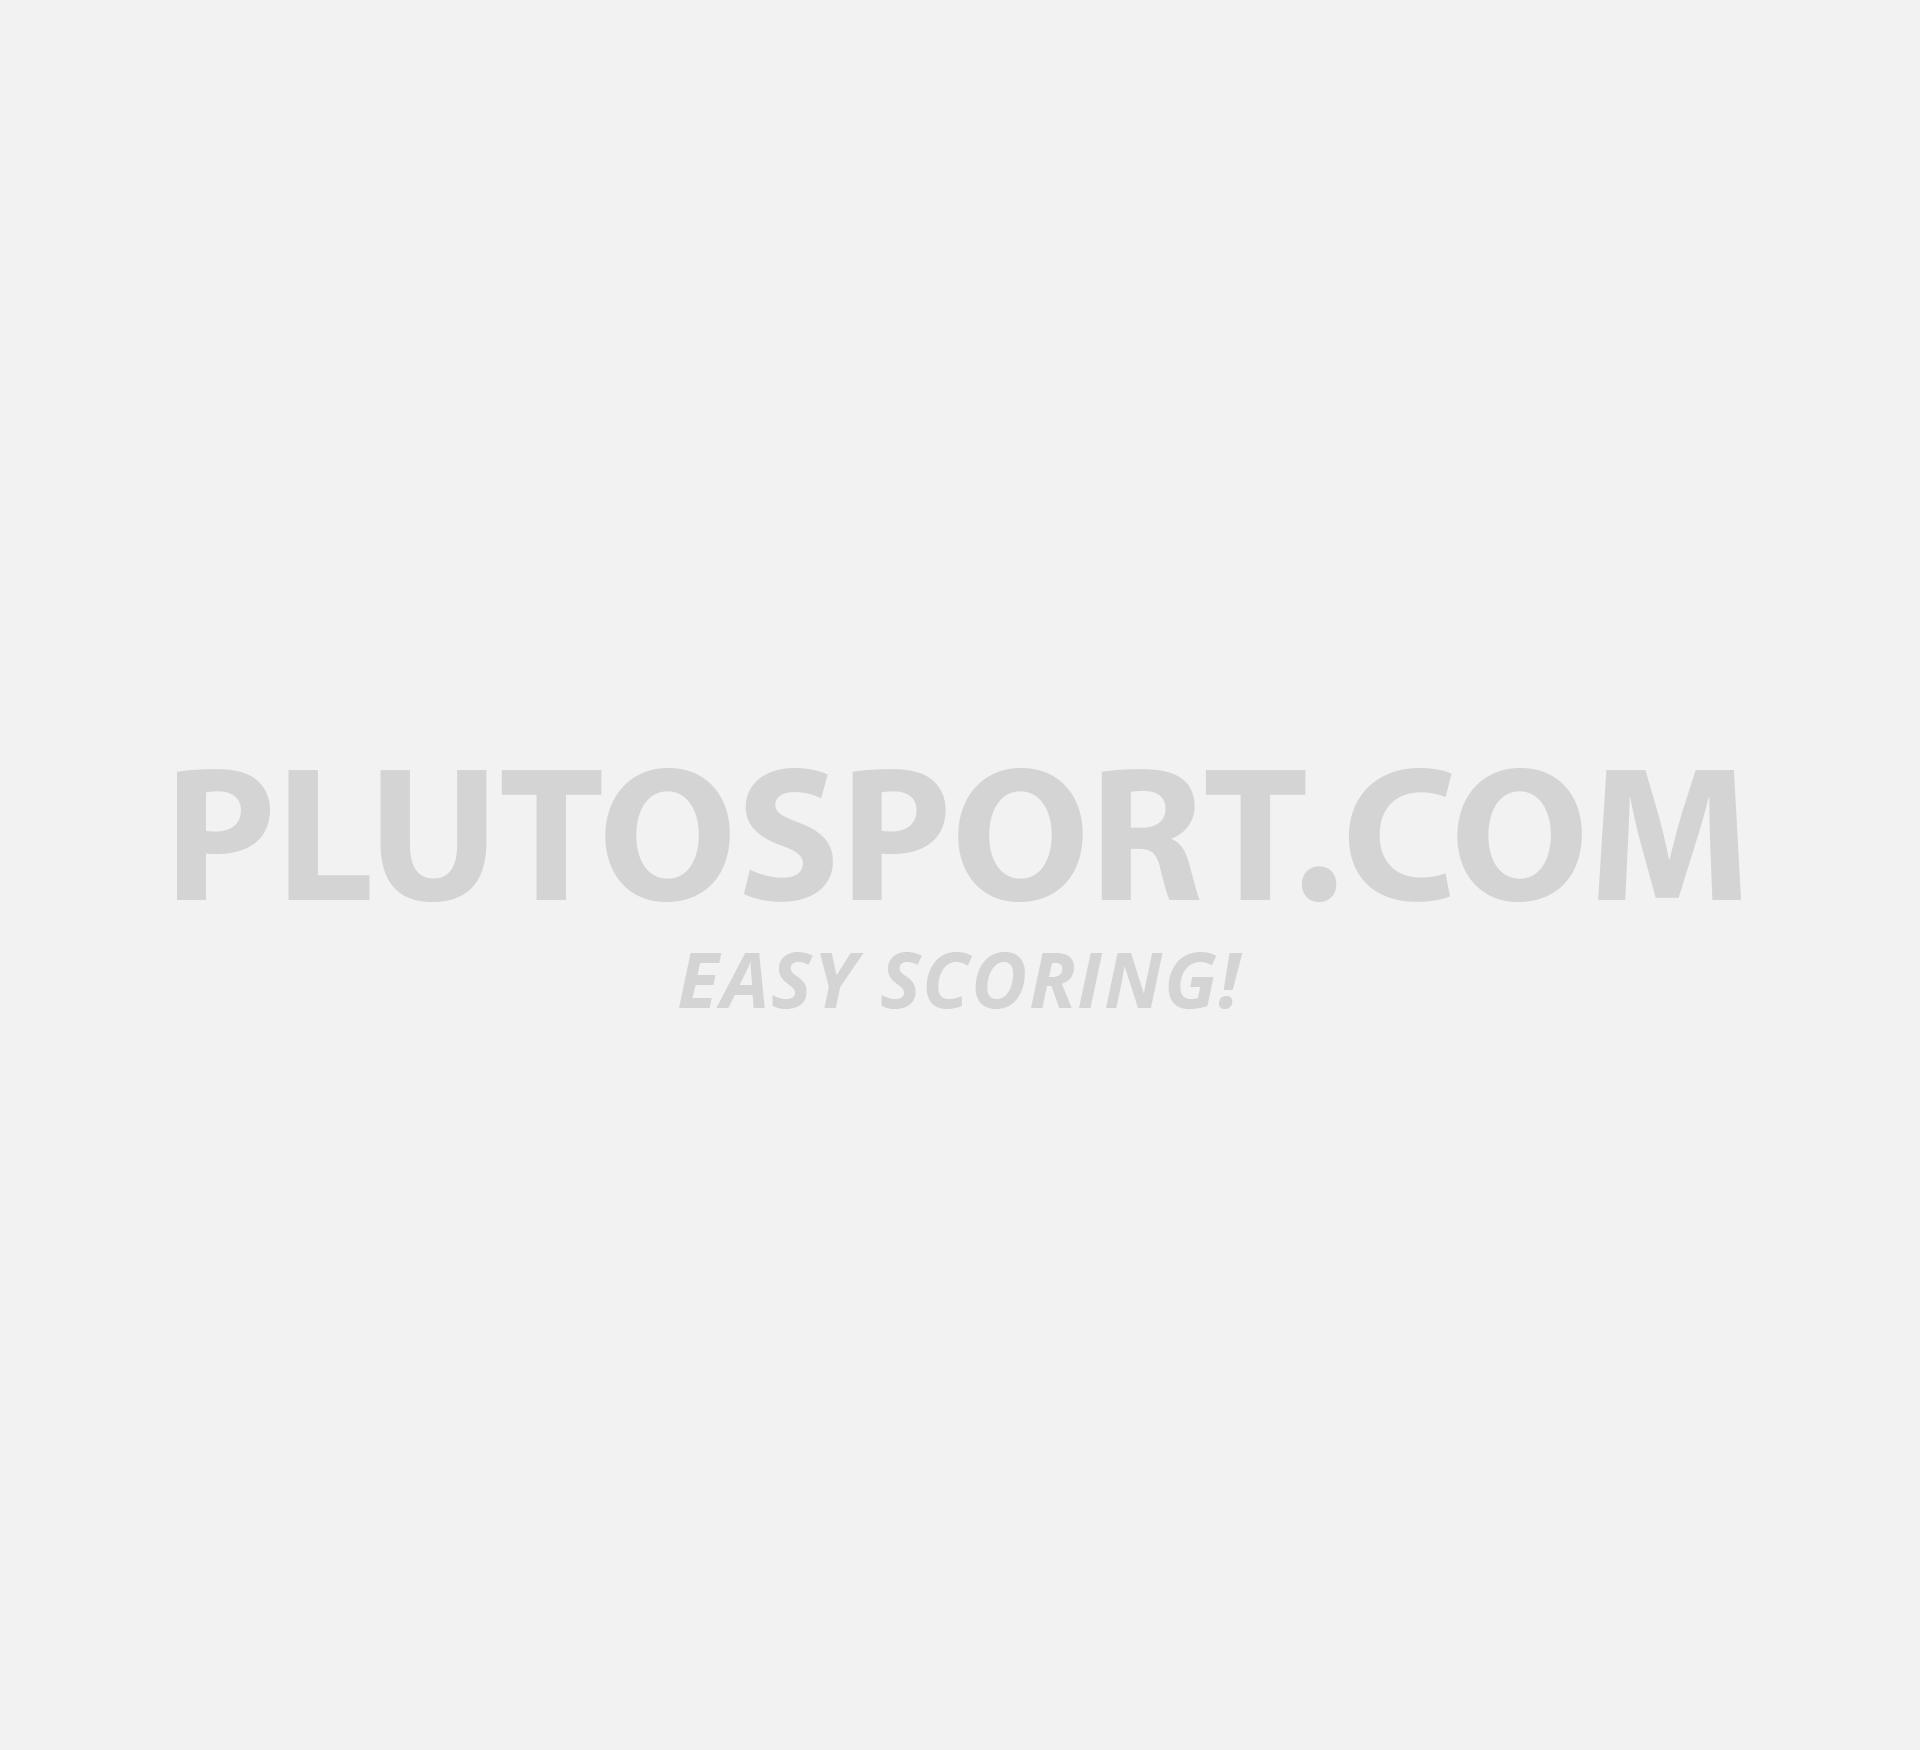 new concept f77d4 e6839 Nike Jr Hypervenom Phelon 3 DF AG-Pro - Turf shoes - Shoes - Football -  Women  Plutosport